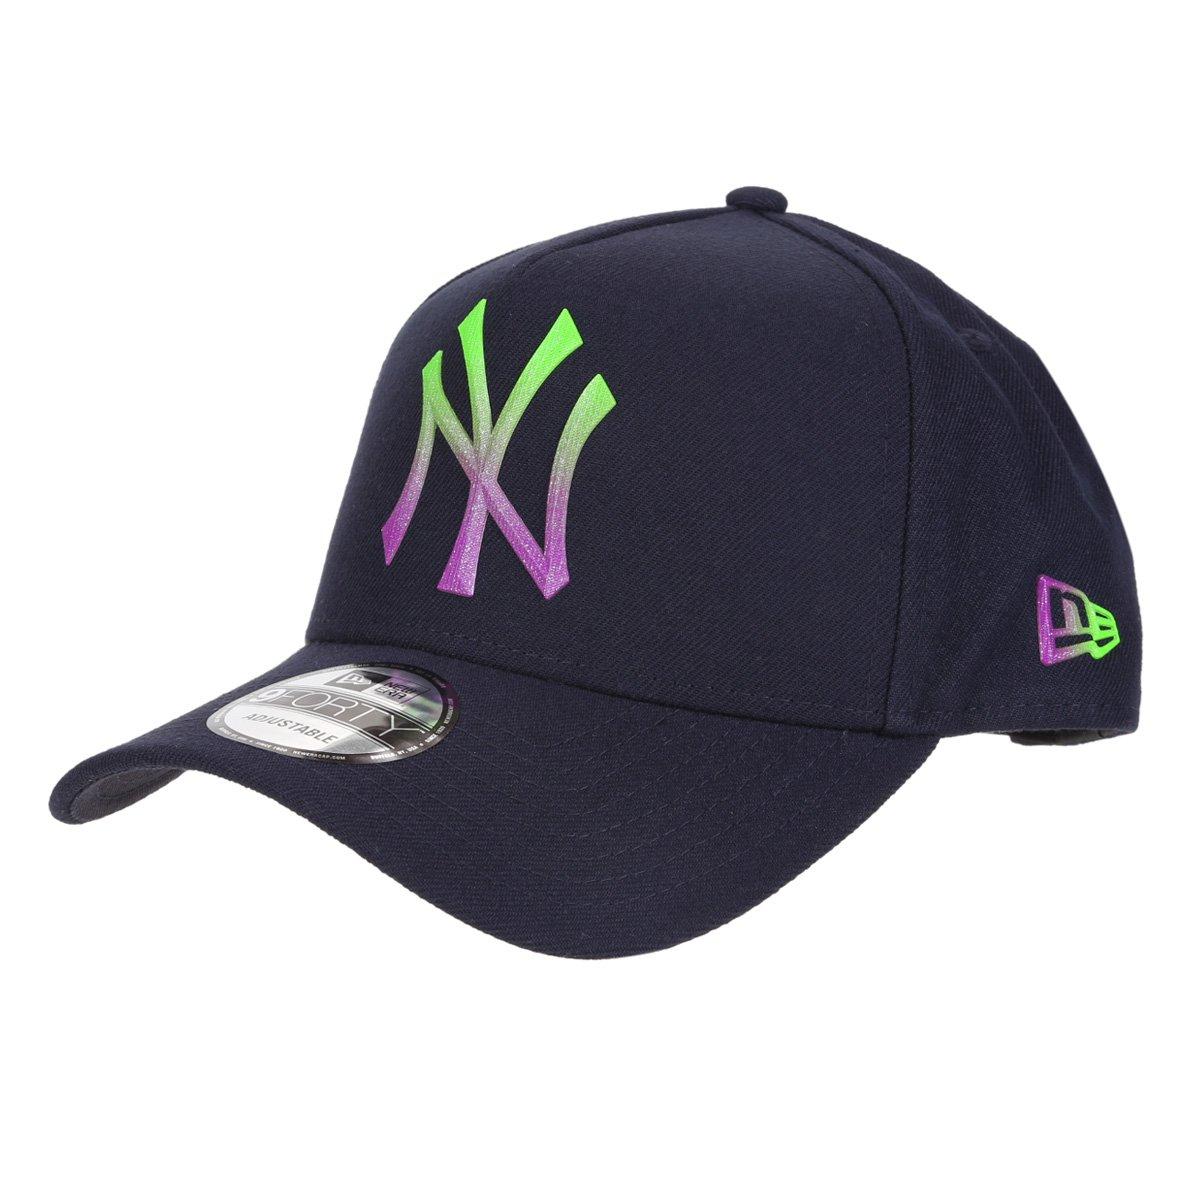 Boné New Era MLB New York Yankees Aba Curva Snapback  A-Frame Rave Space Gradiente 9Forty